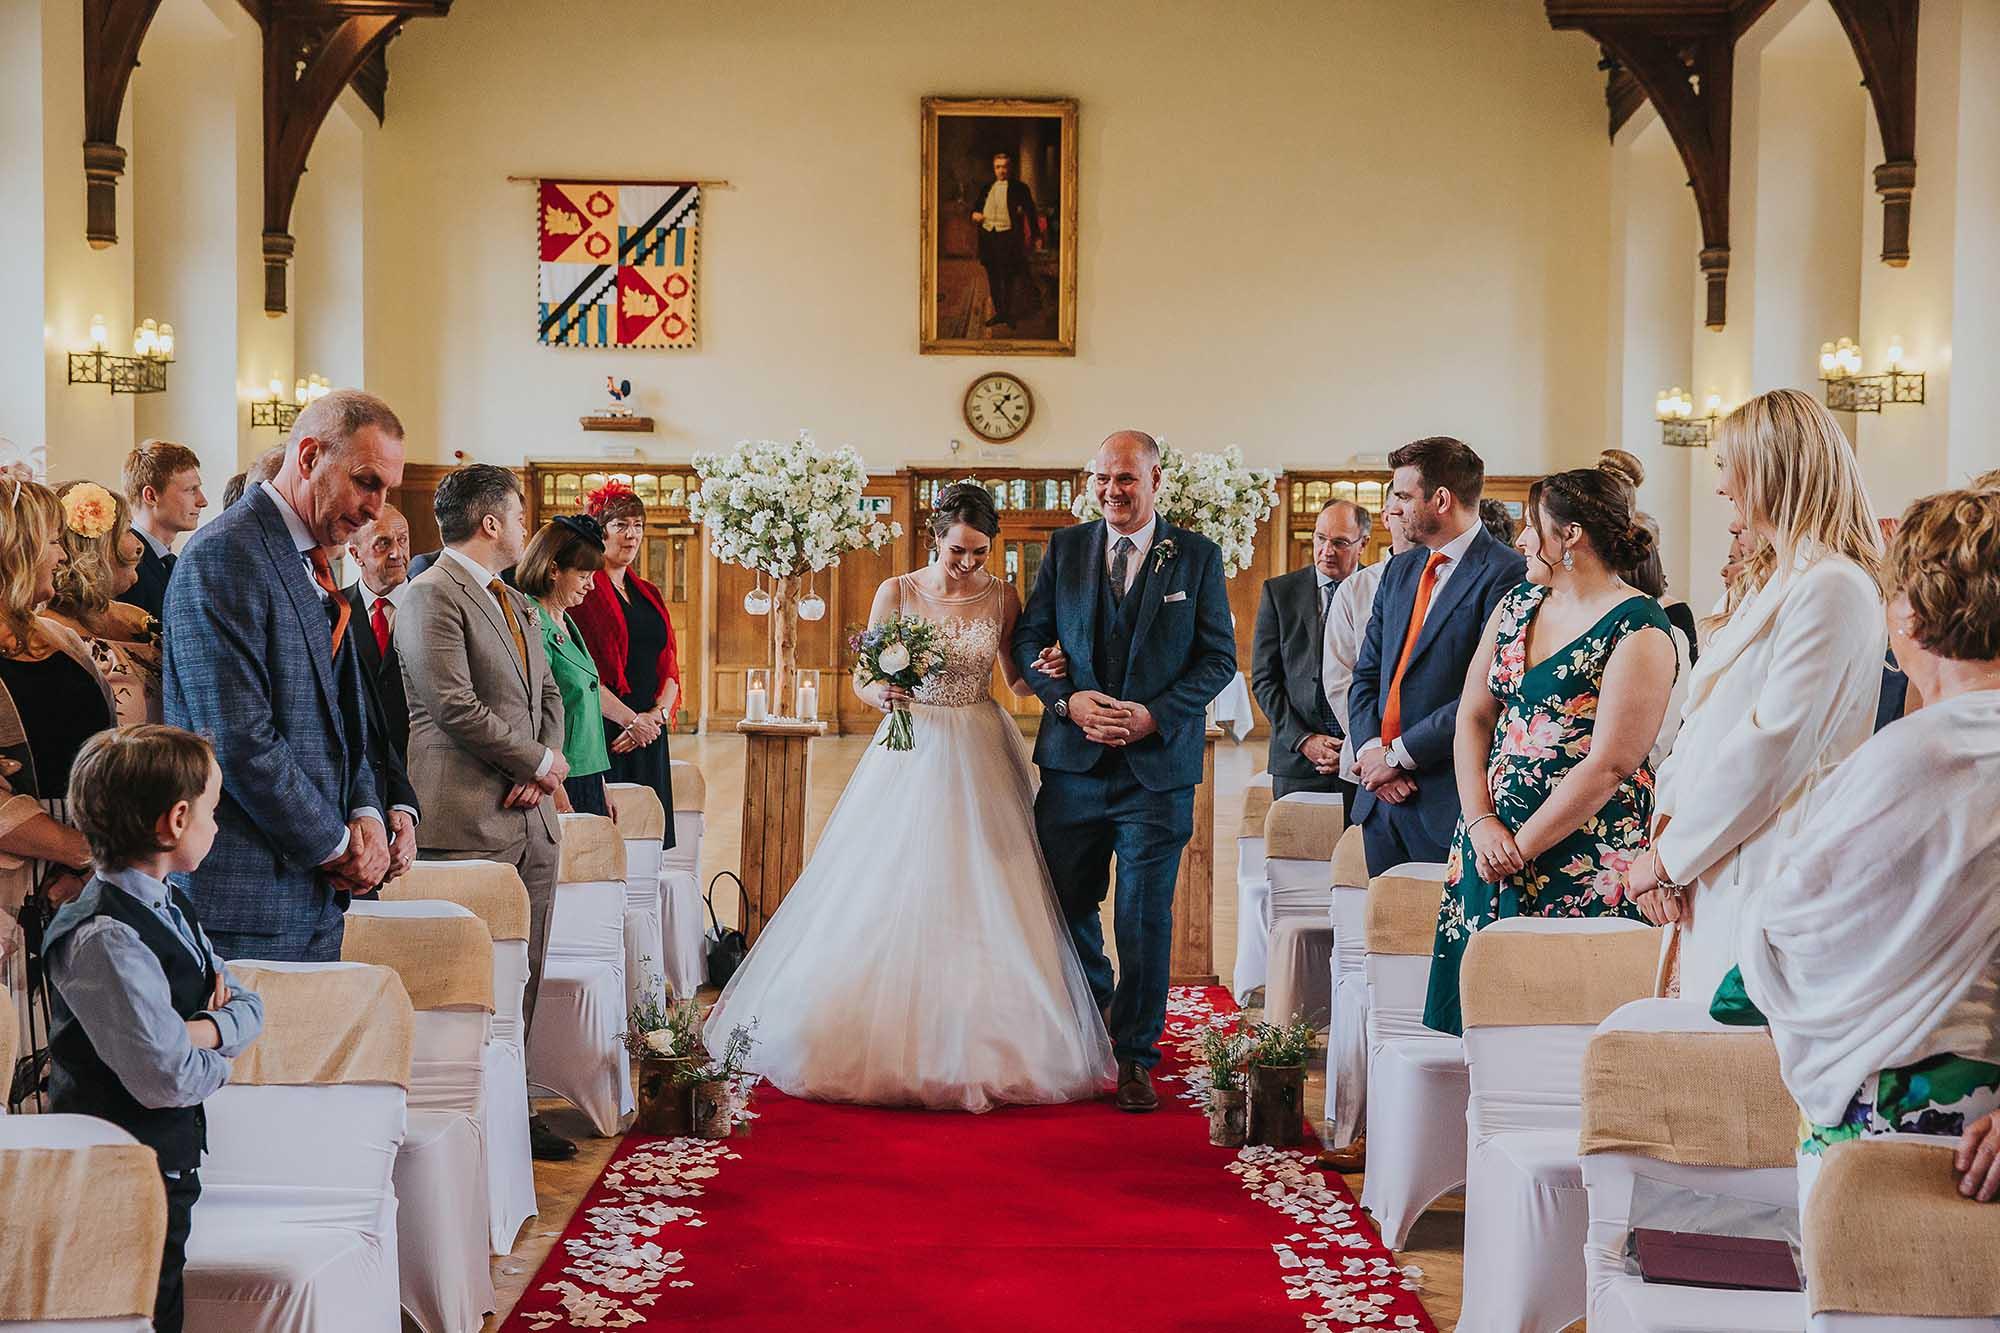 Bolton School wedding ceremony